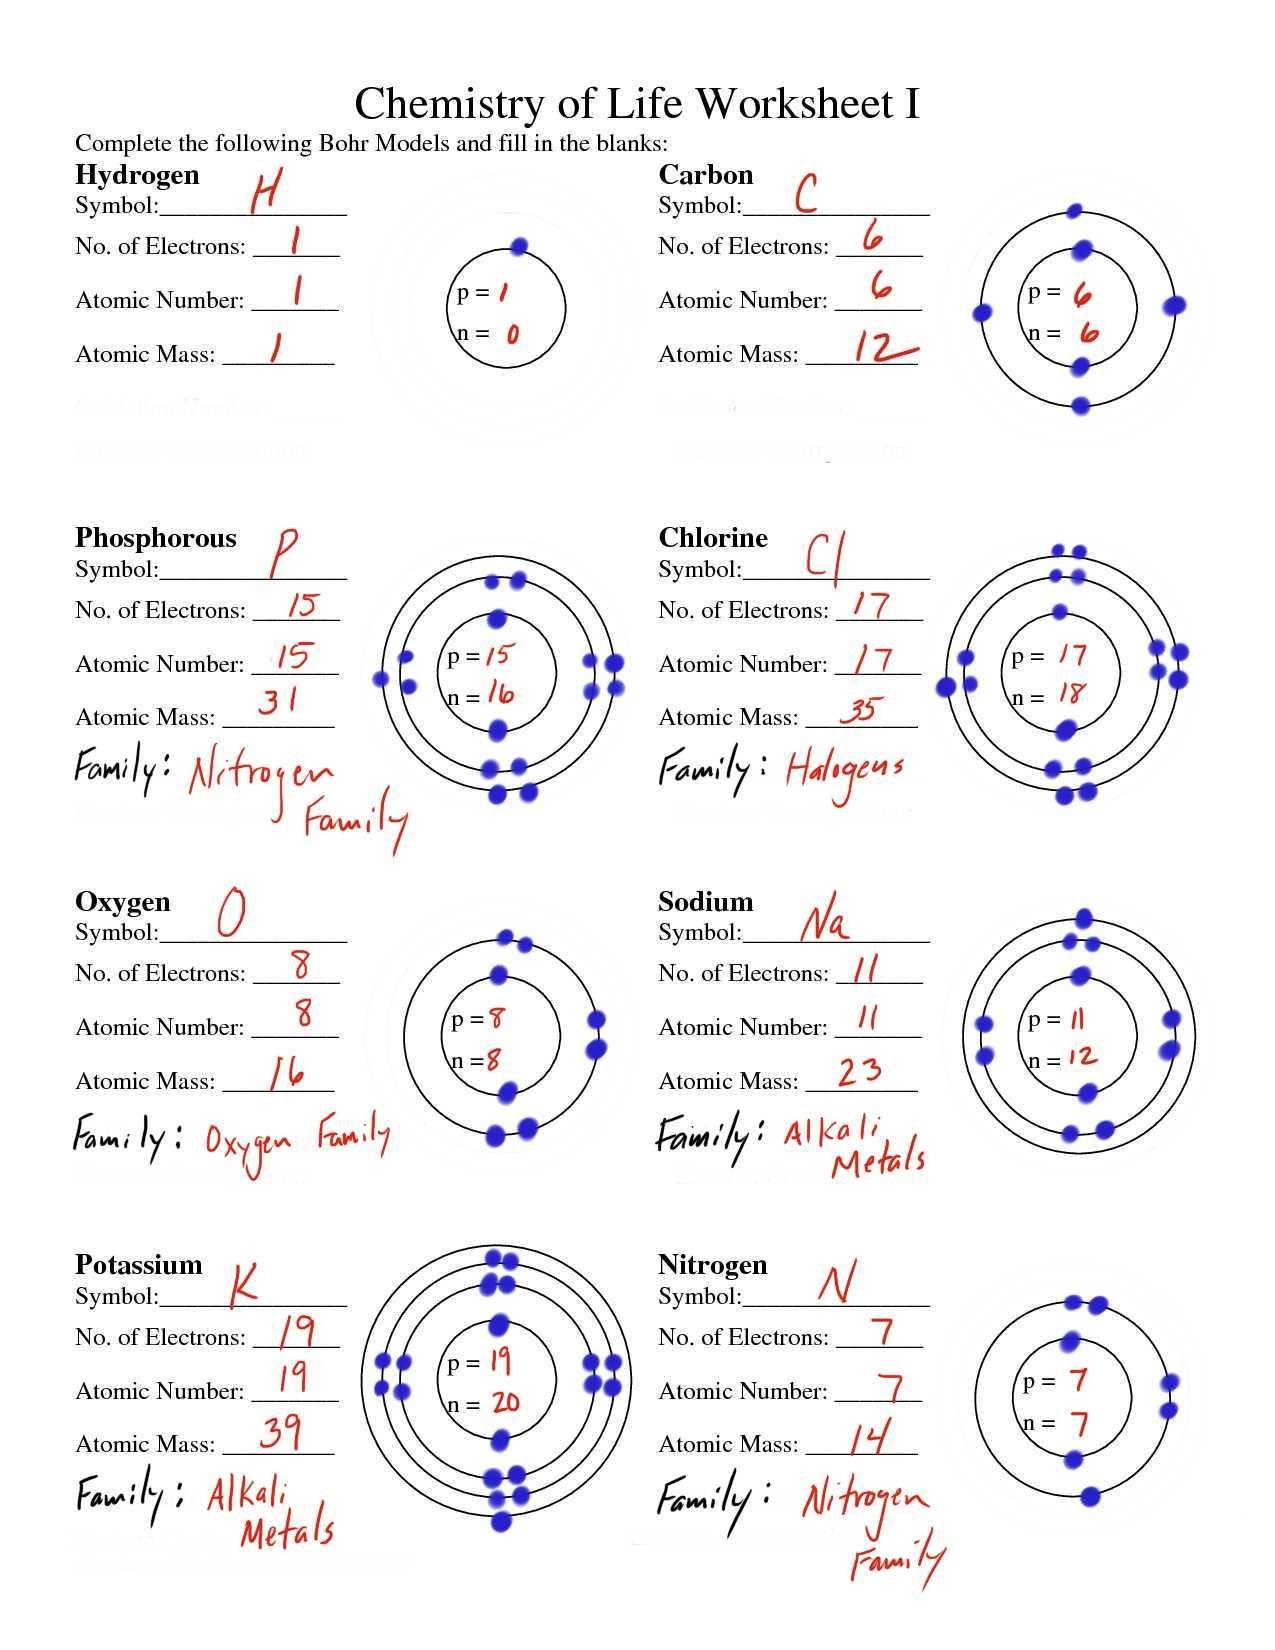 30 Bohr Model Worksheet Answers